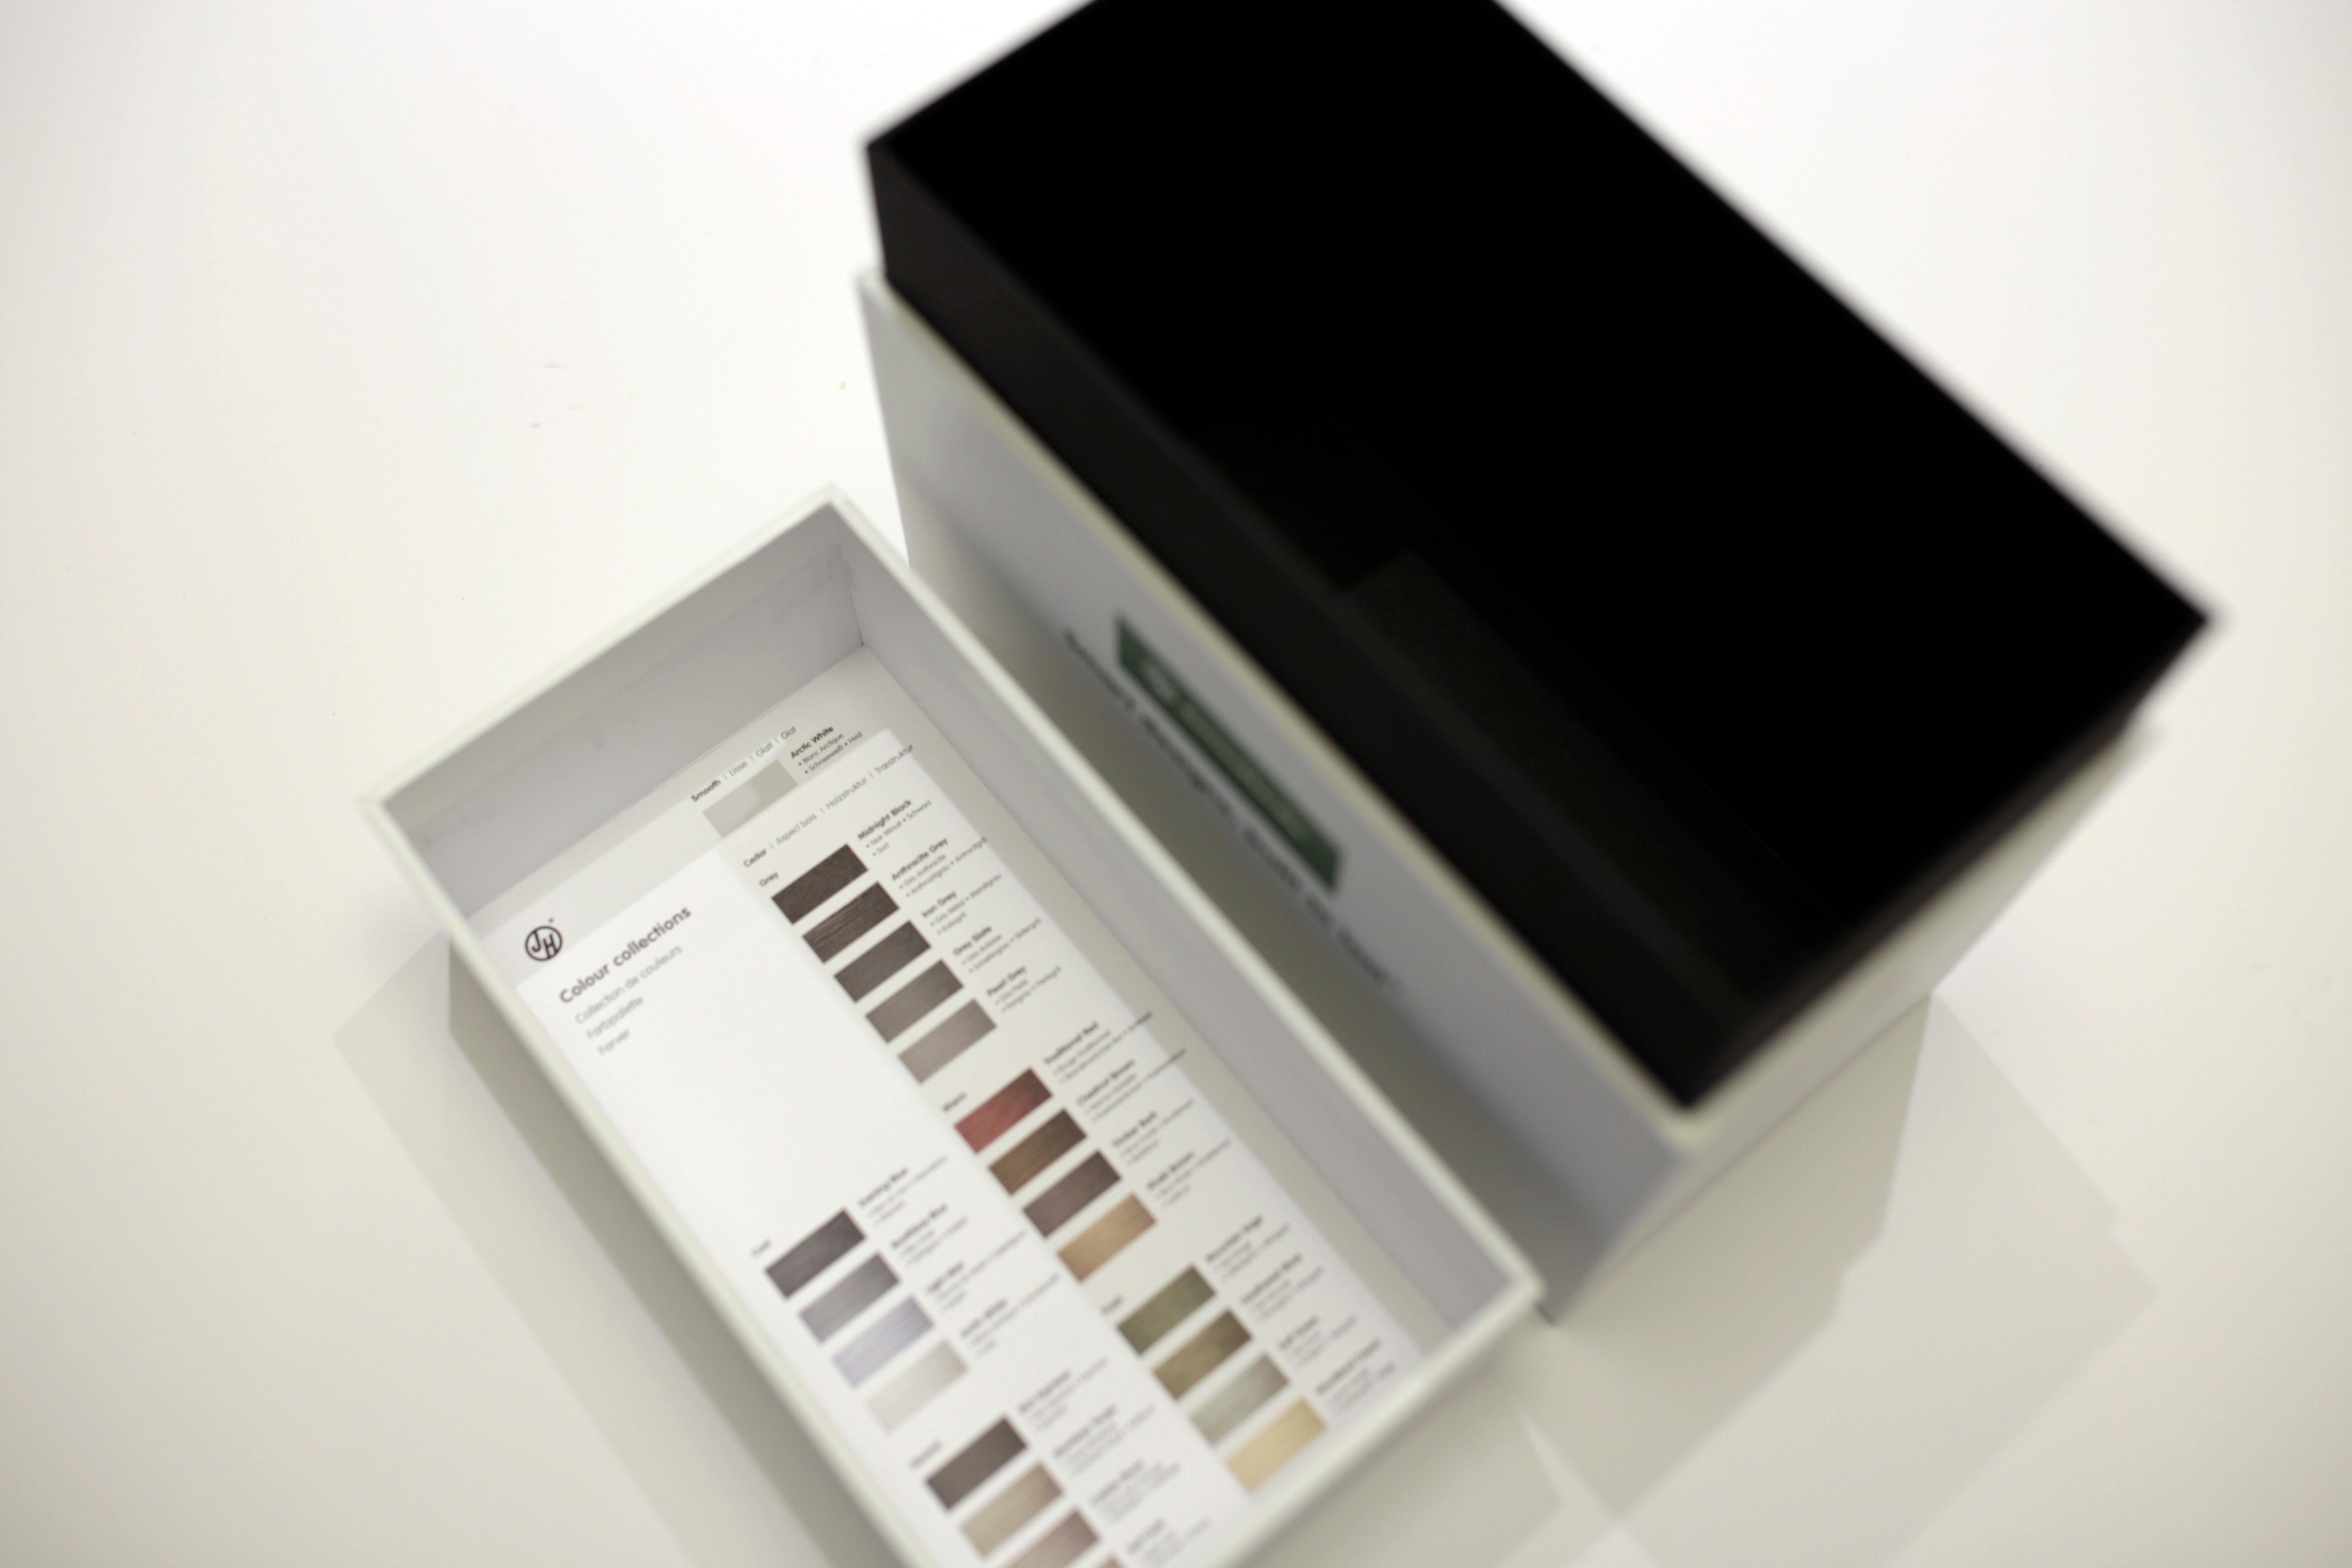 Image of opened sample box